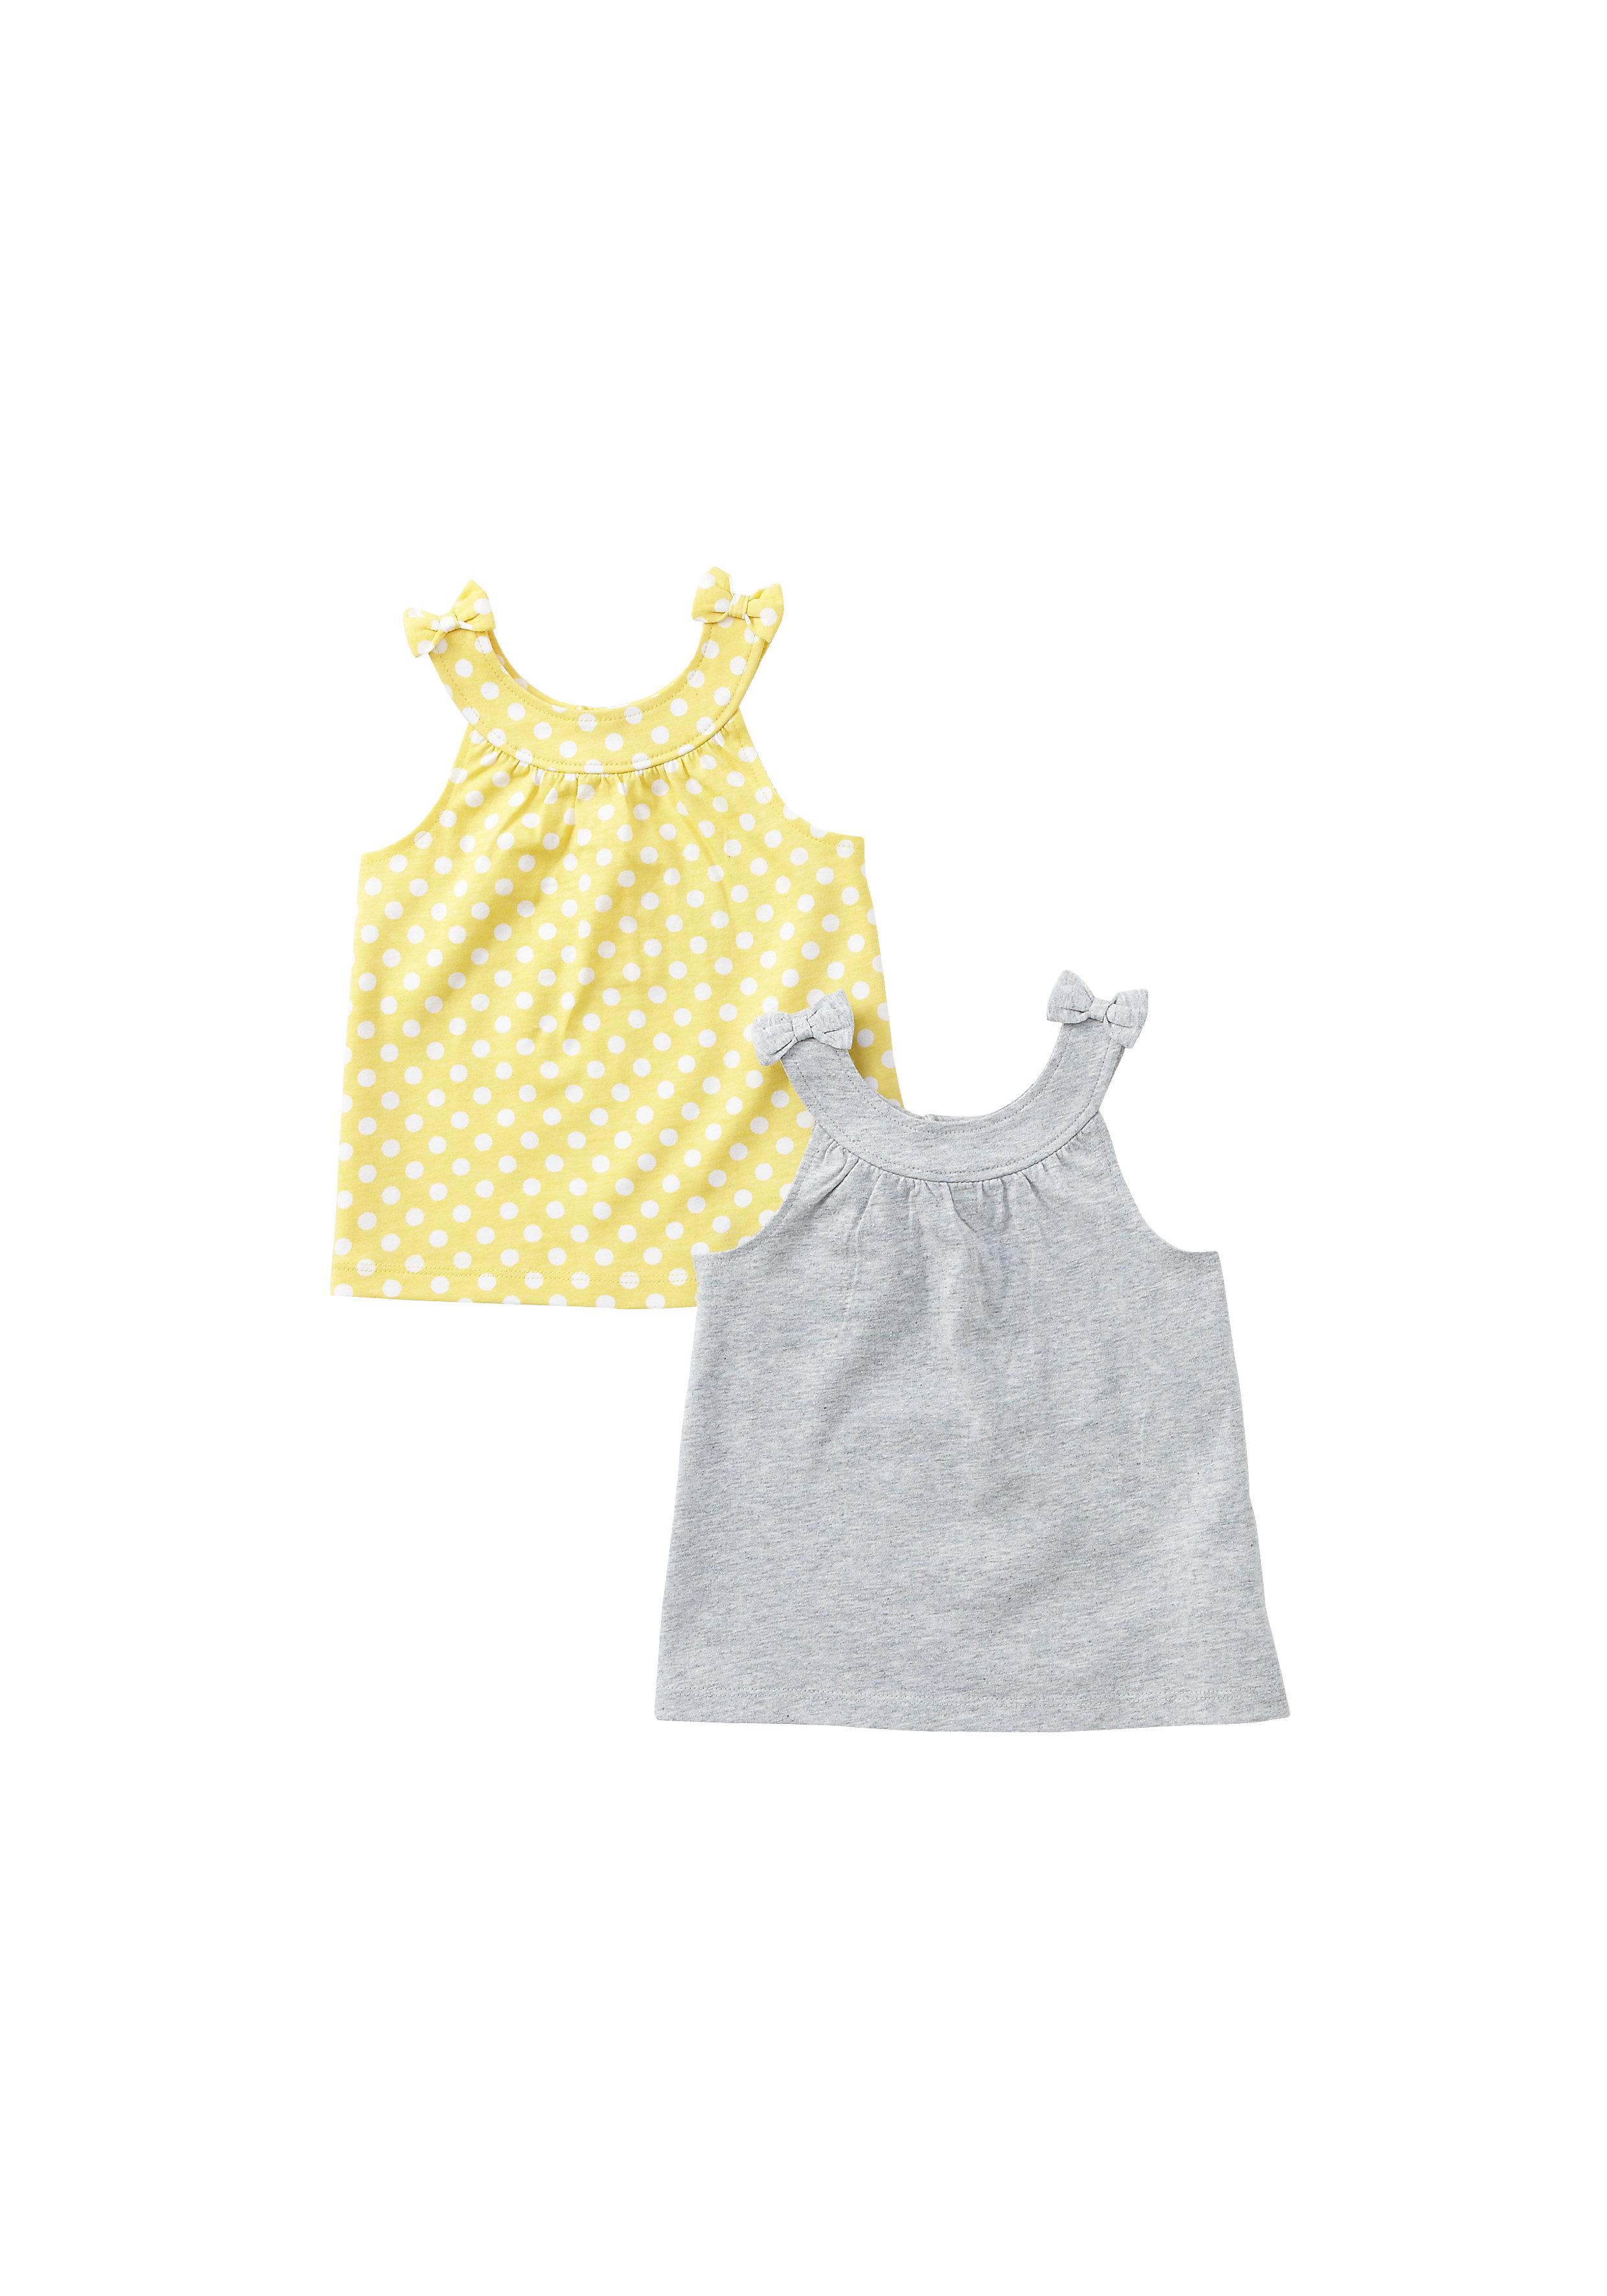 Mothercare | Girls Sleeveless Tops Polka Dot Print - Pack Of 2 - Multicolor